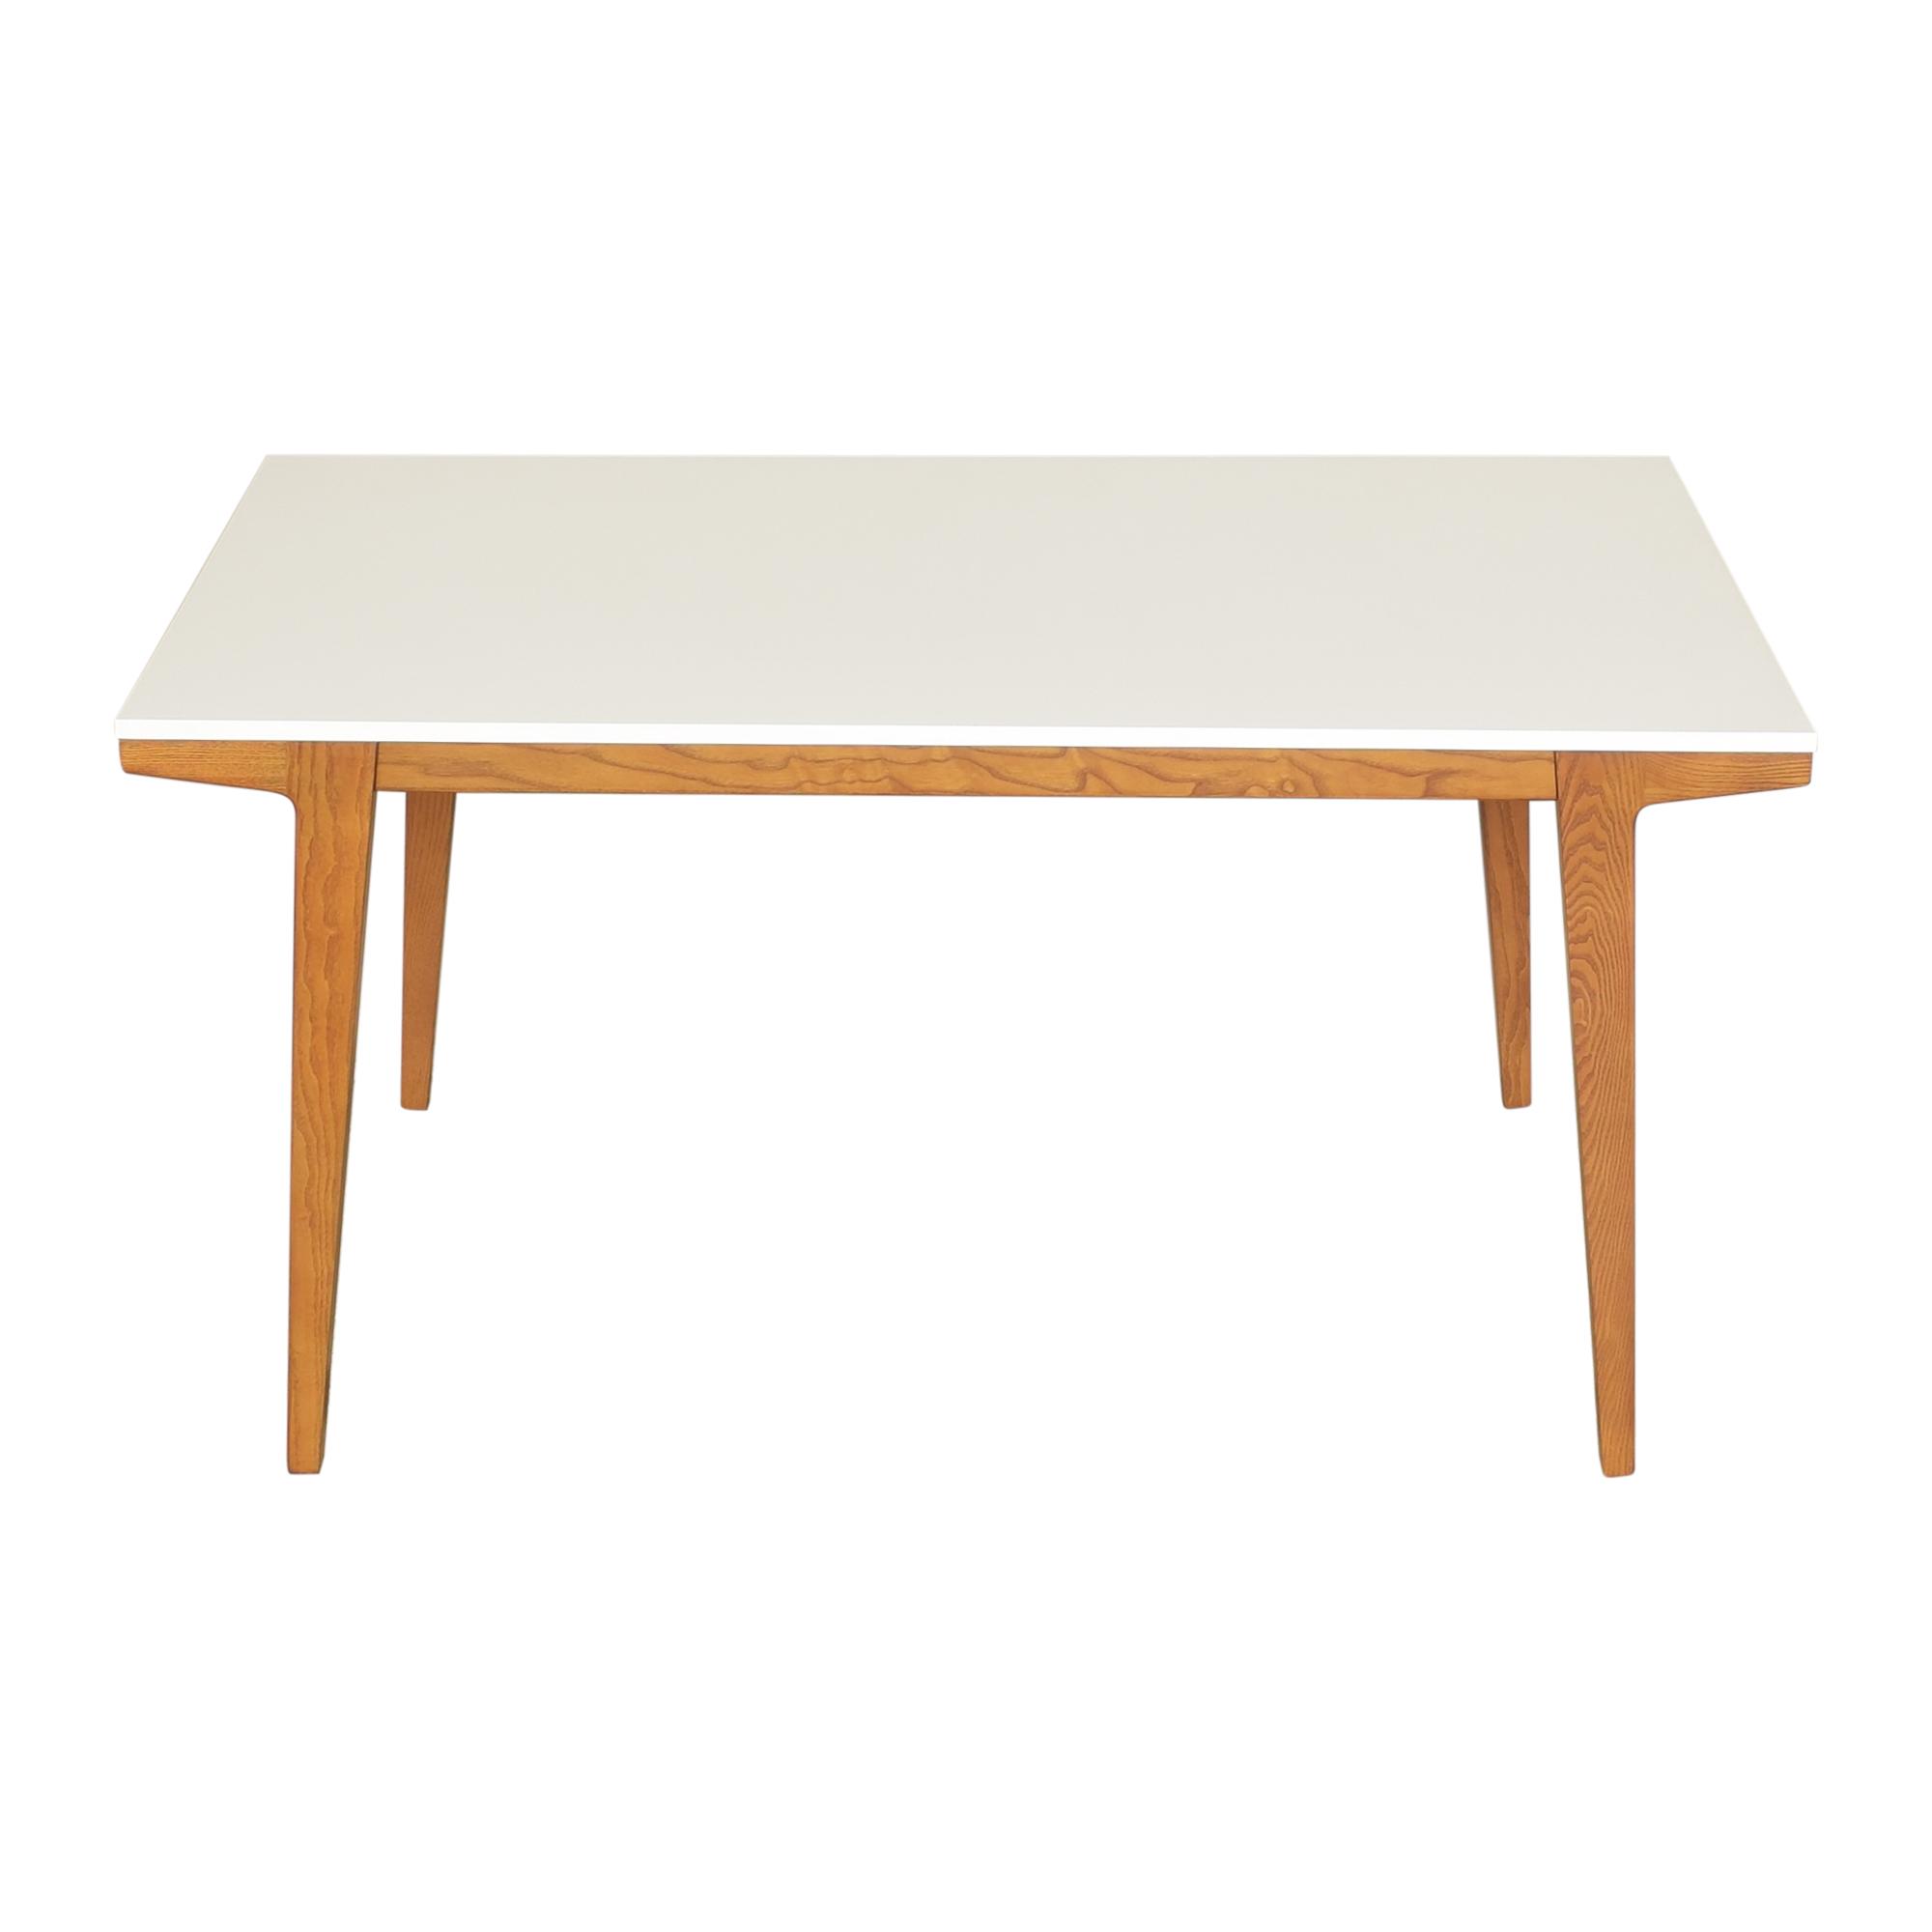 West Elm West Elm Modern Dining Table on sale